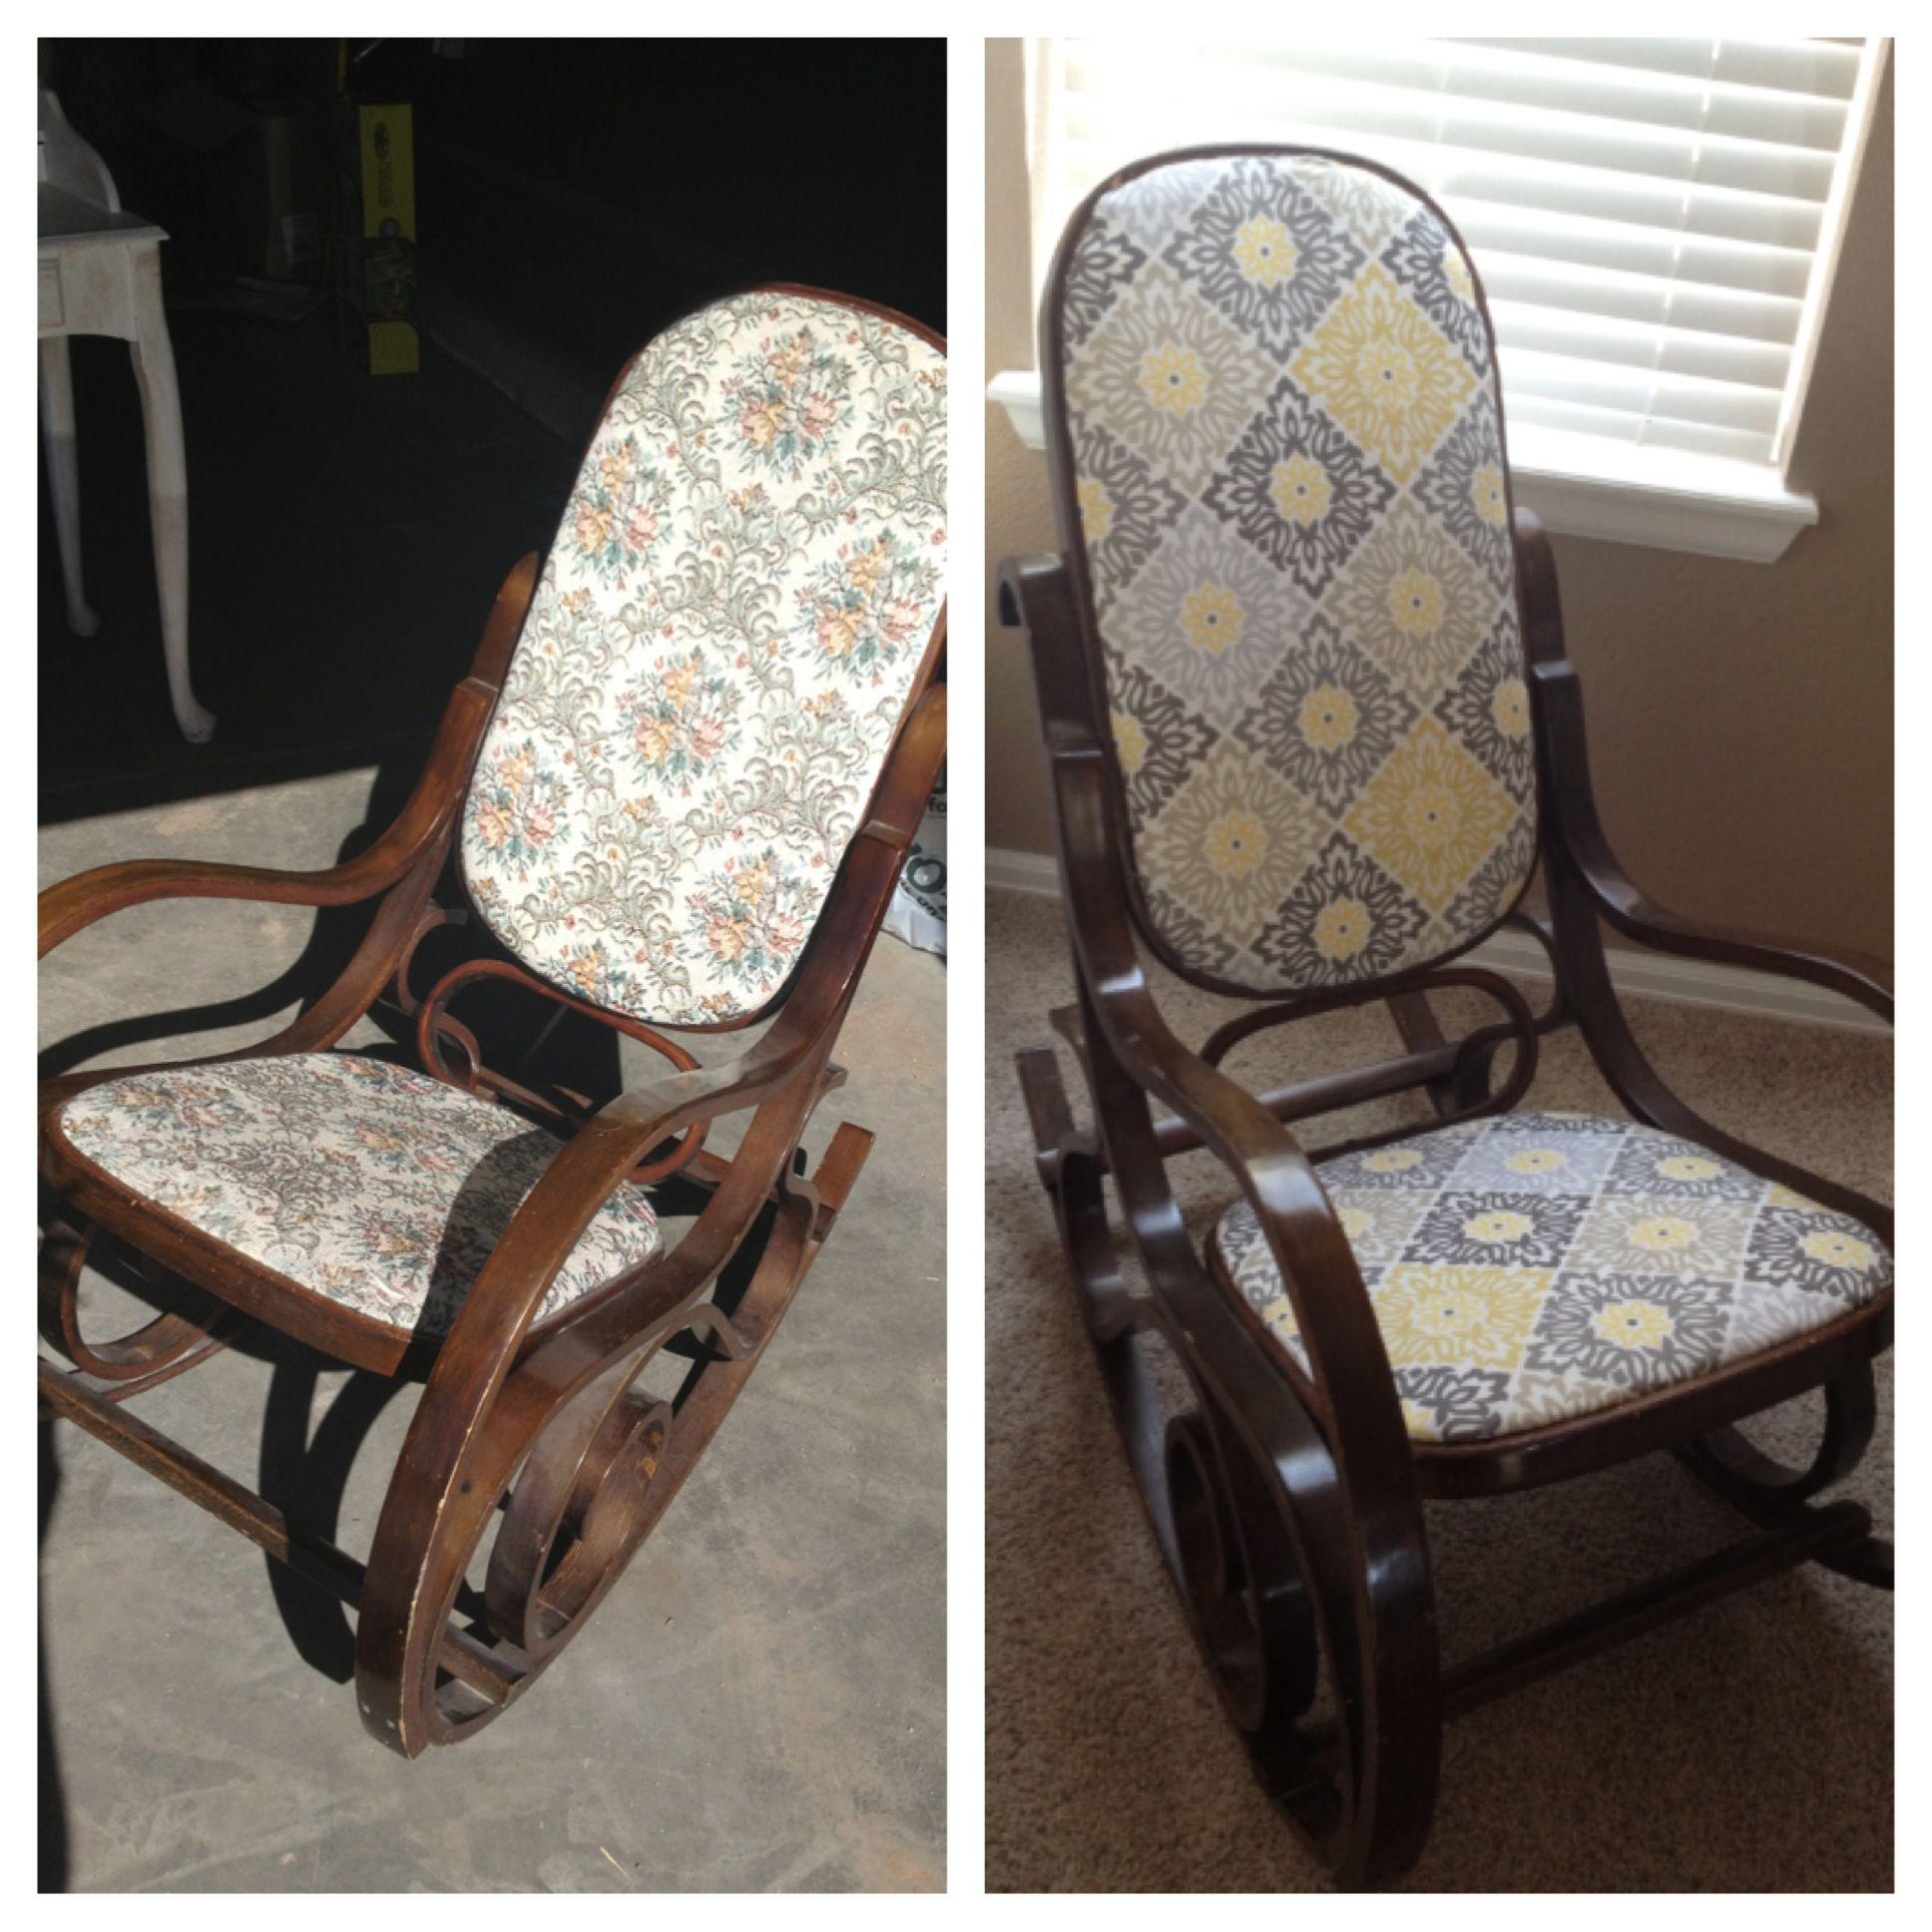 Reupholster Rocking Chair Ideas Home & Interior Design